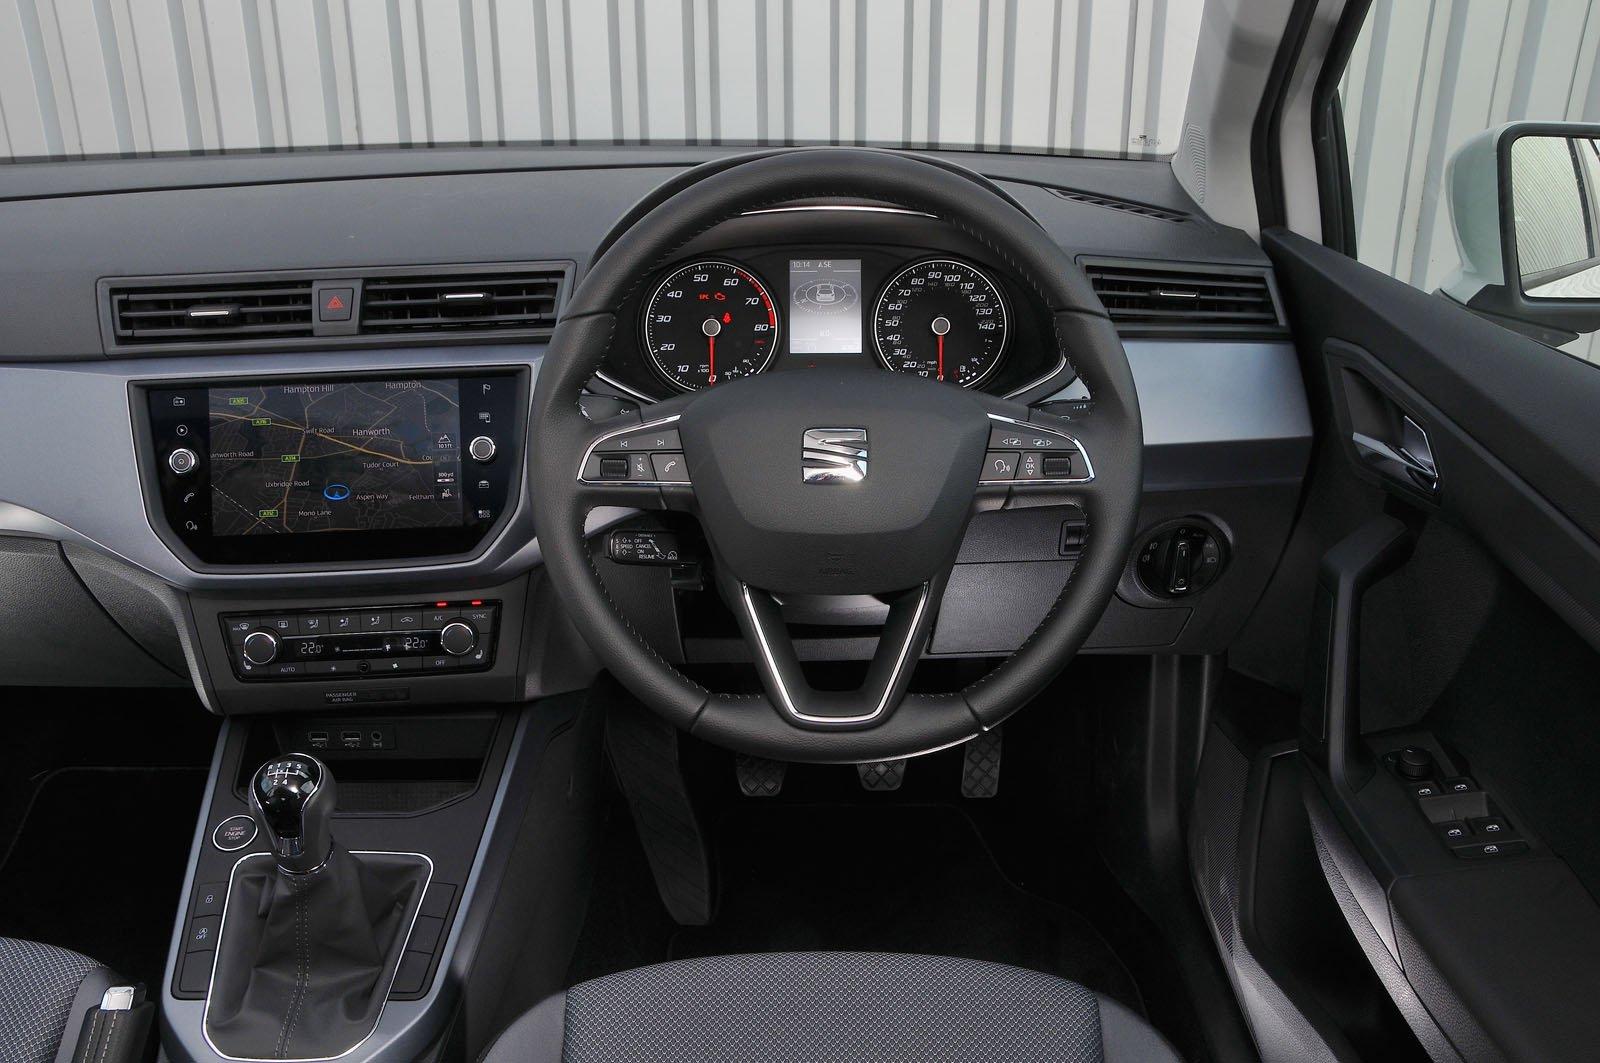 Seat Arona 1.0 TSI SE - interior